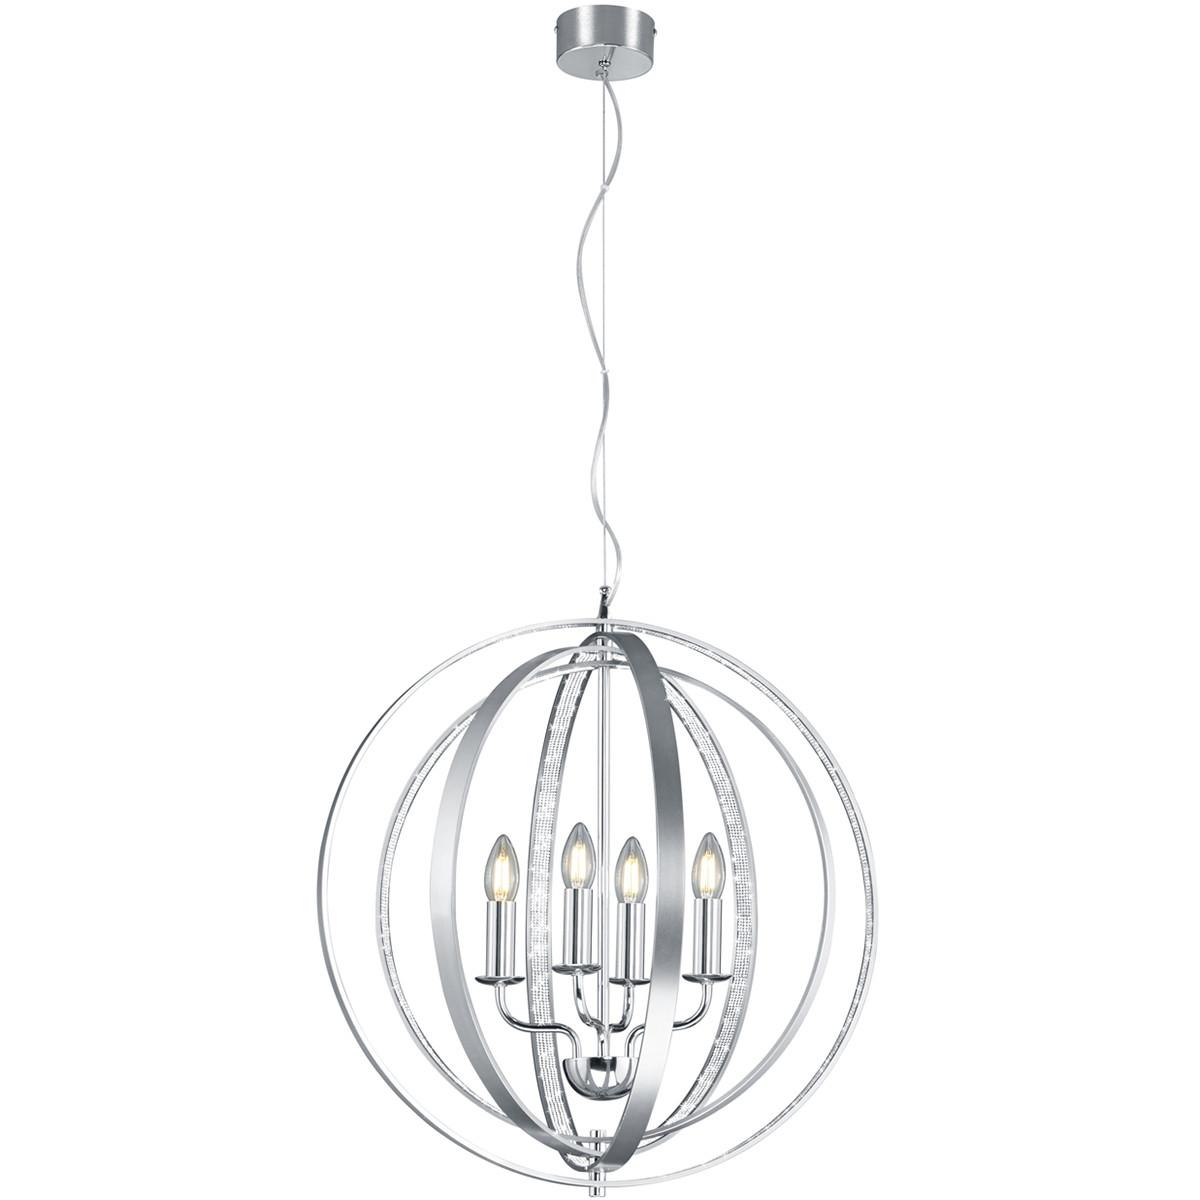 LED Hanglamp - Trion Carzola - E14 Fitting - Rond - Mat Chroom - Aluminium